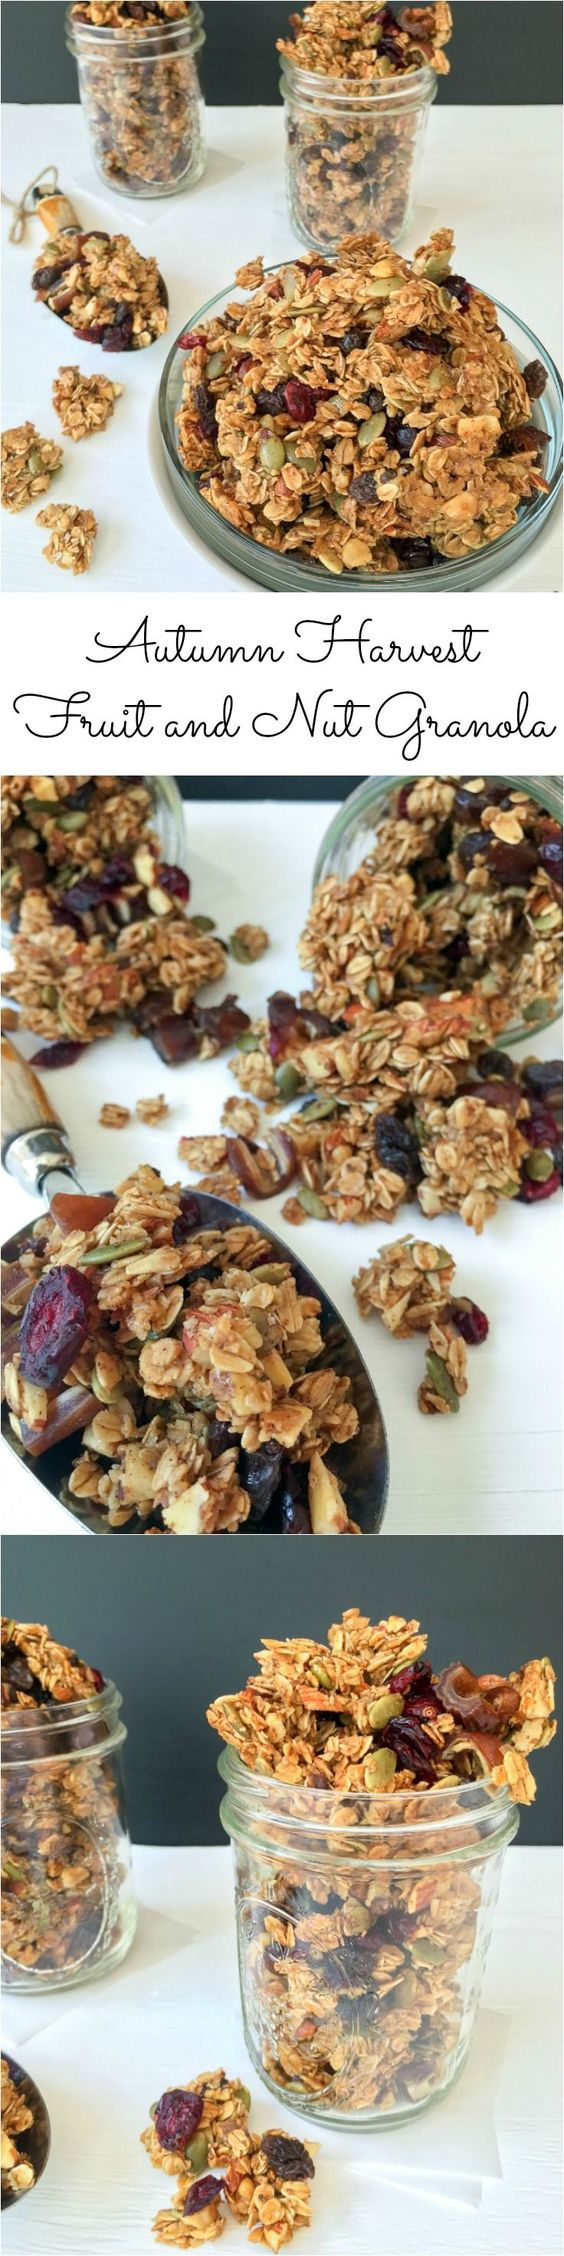 ... cinnamon, warm vanilla, pumpkin seeds and tart cranberries and is